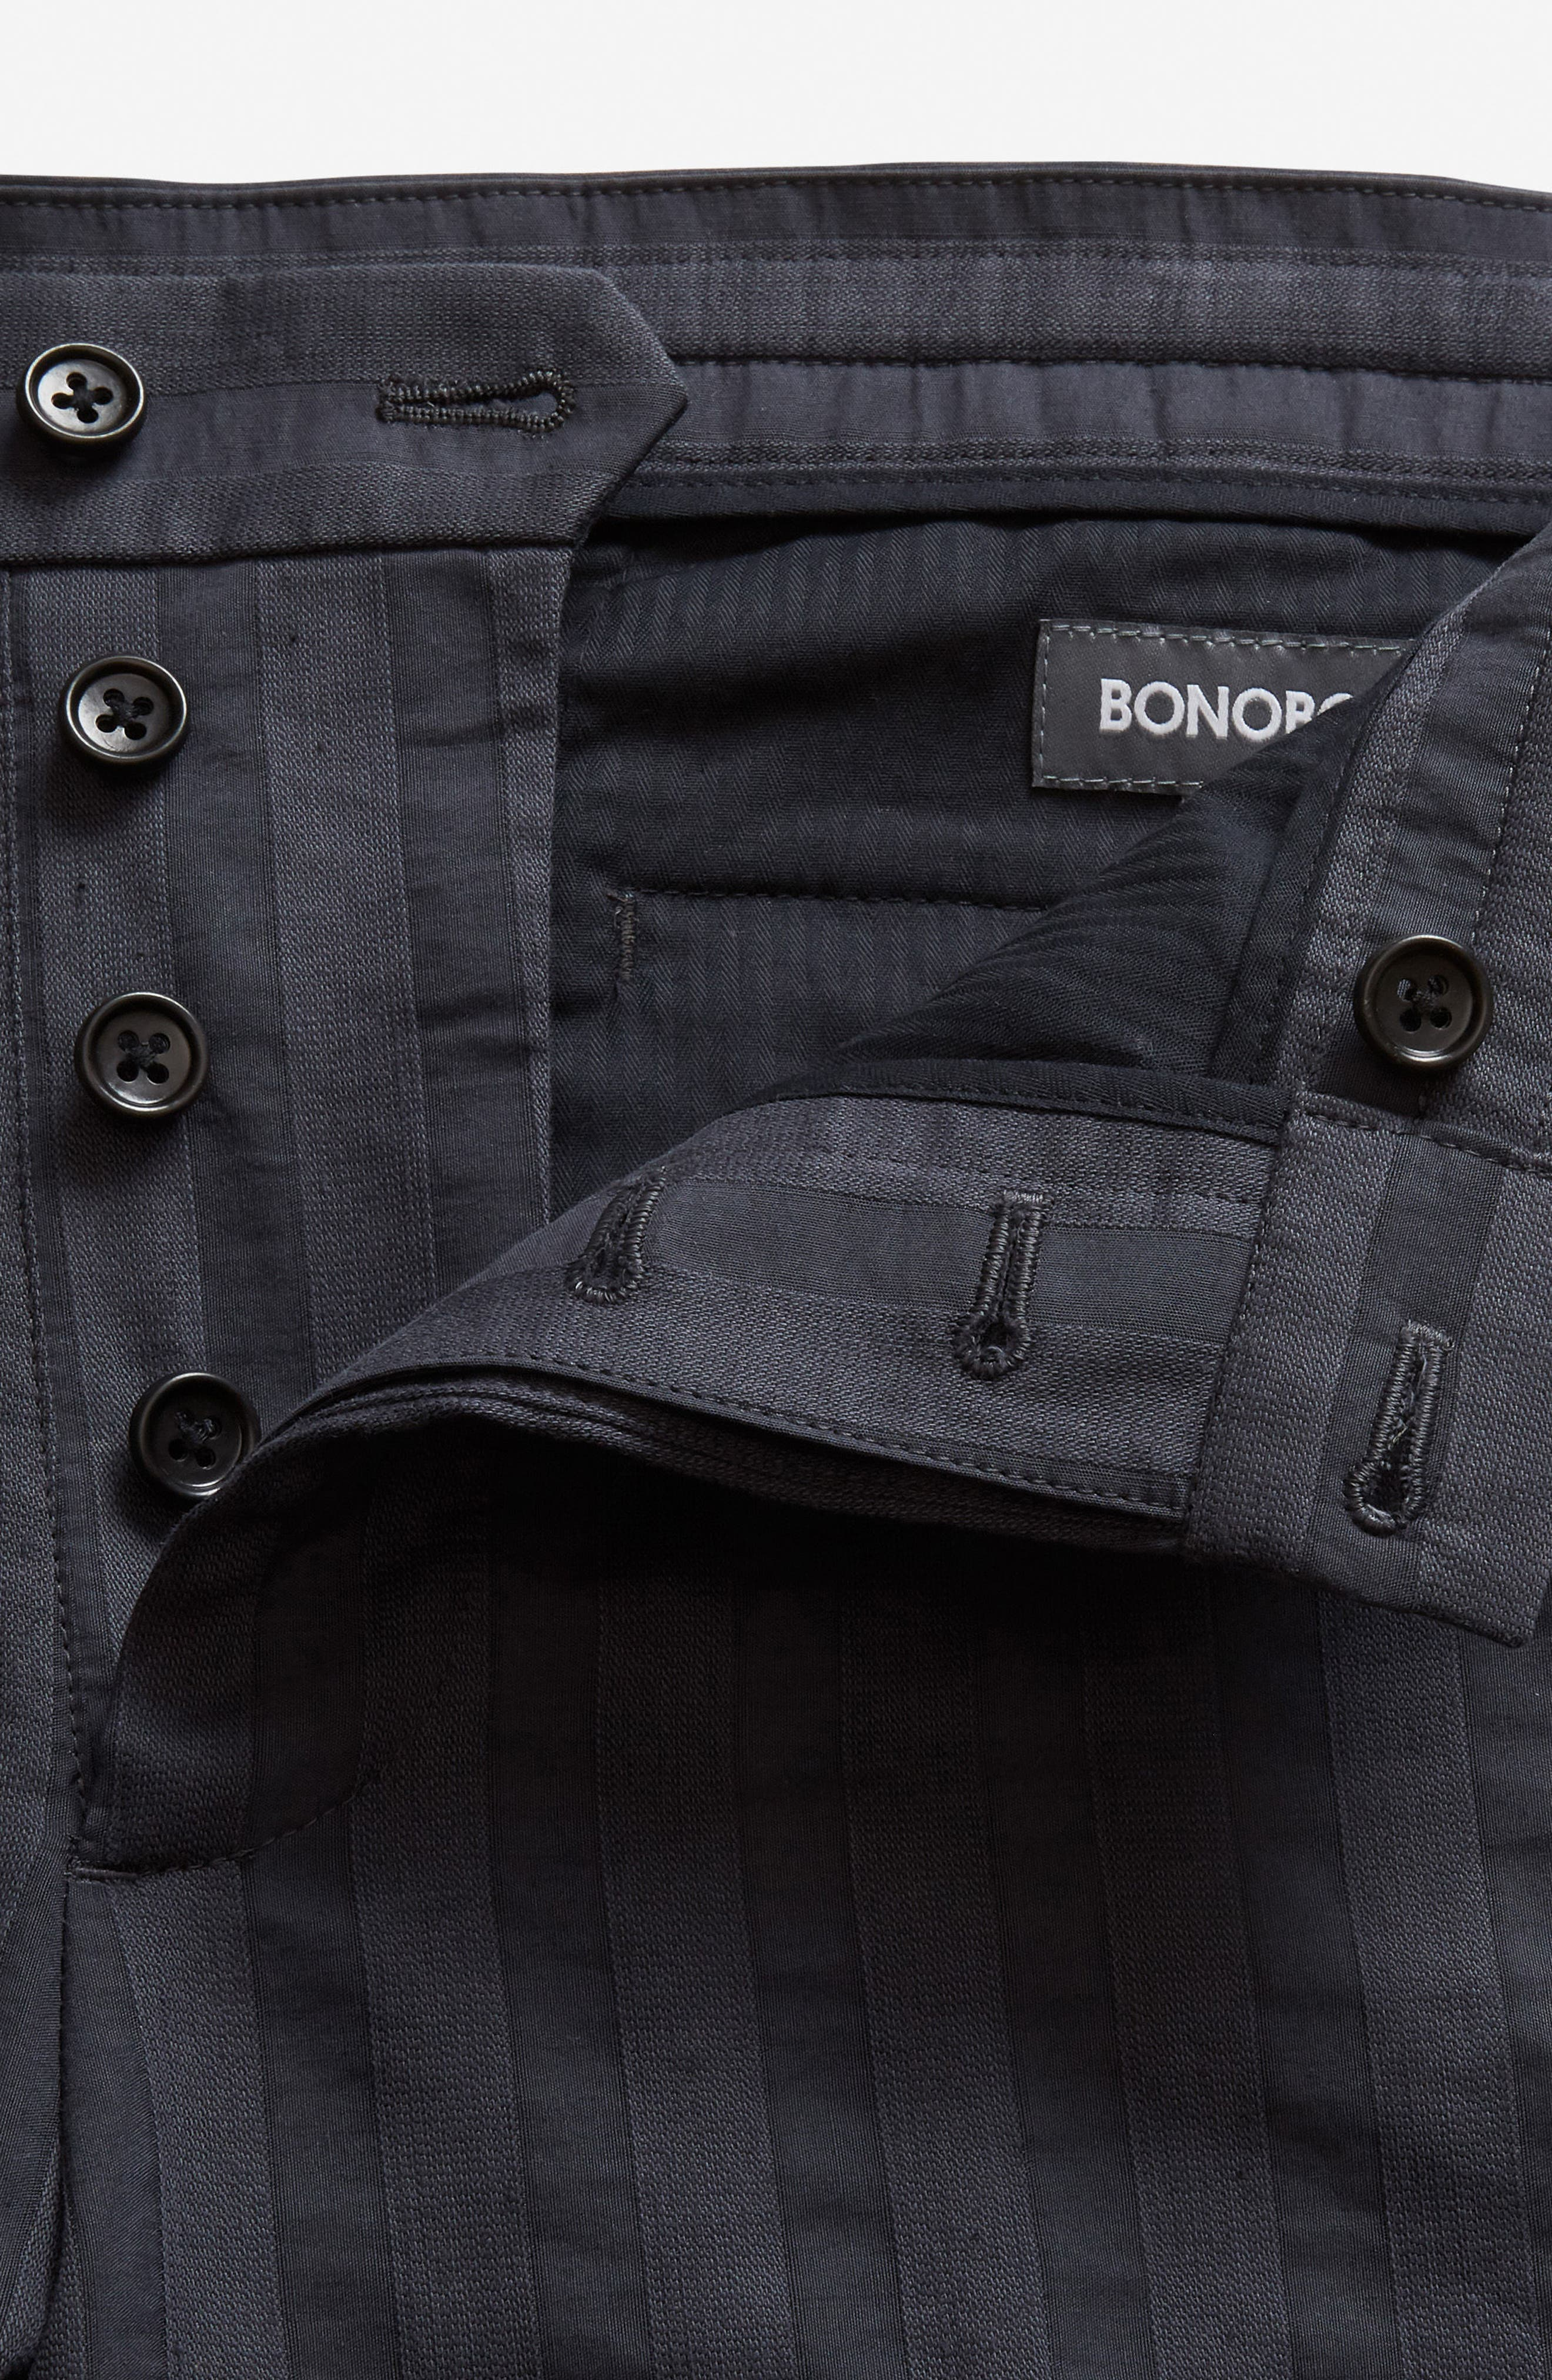 Flat Front Cotton & Linen Blend Trousers,                             Alternate thumbnail 3, color,                             Stripe Shirtmake